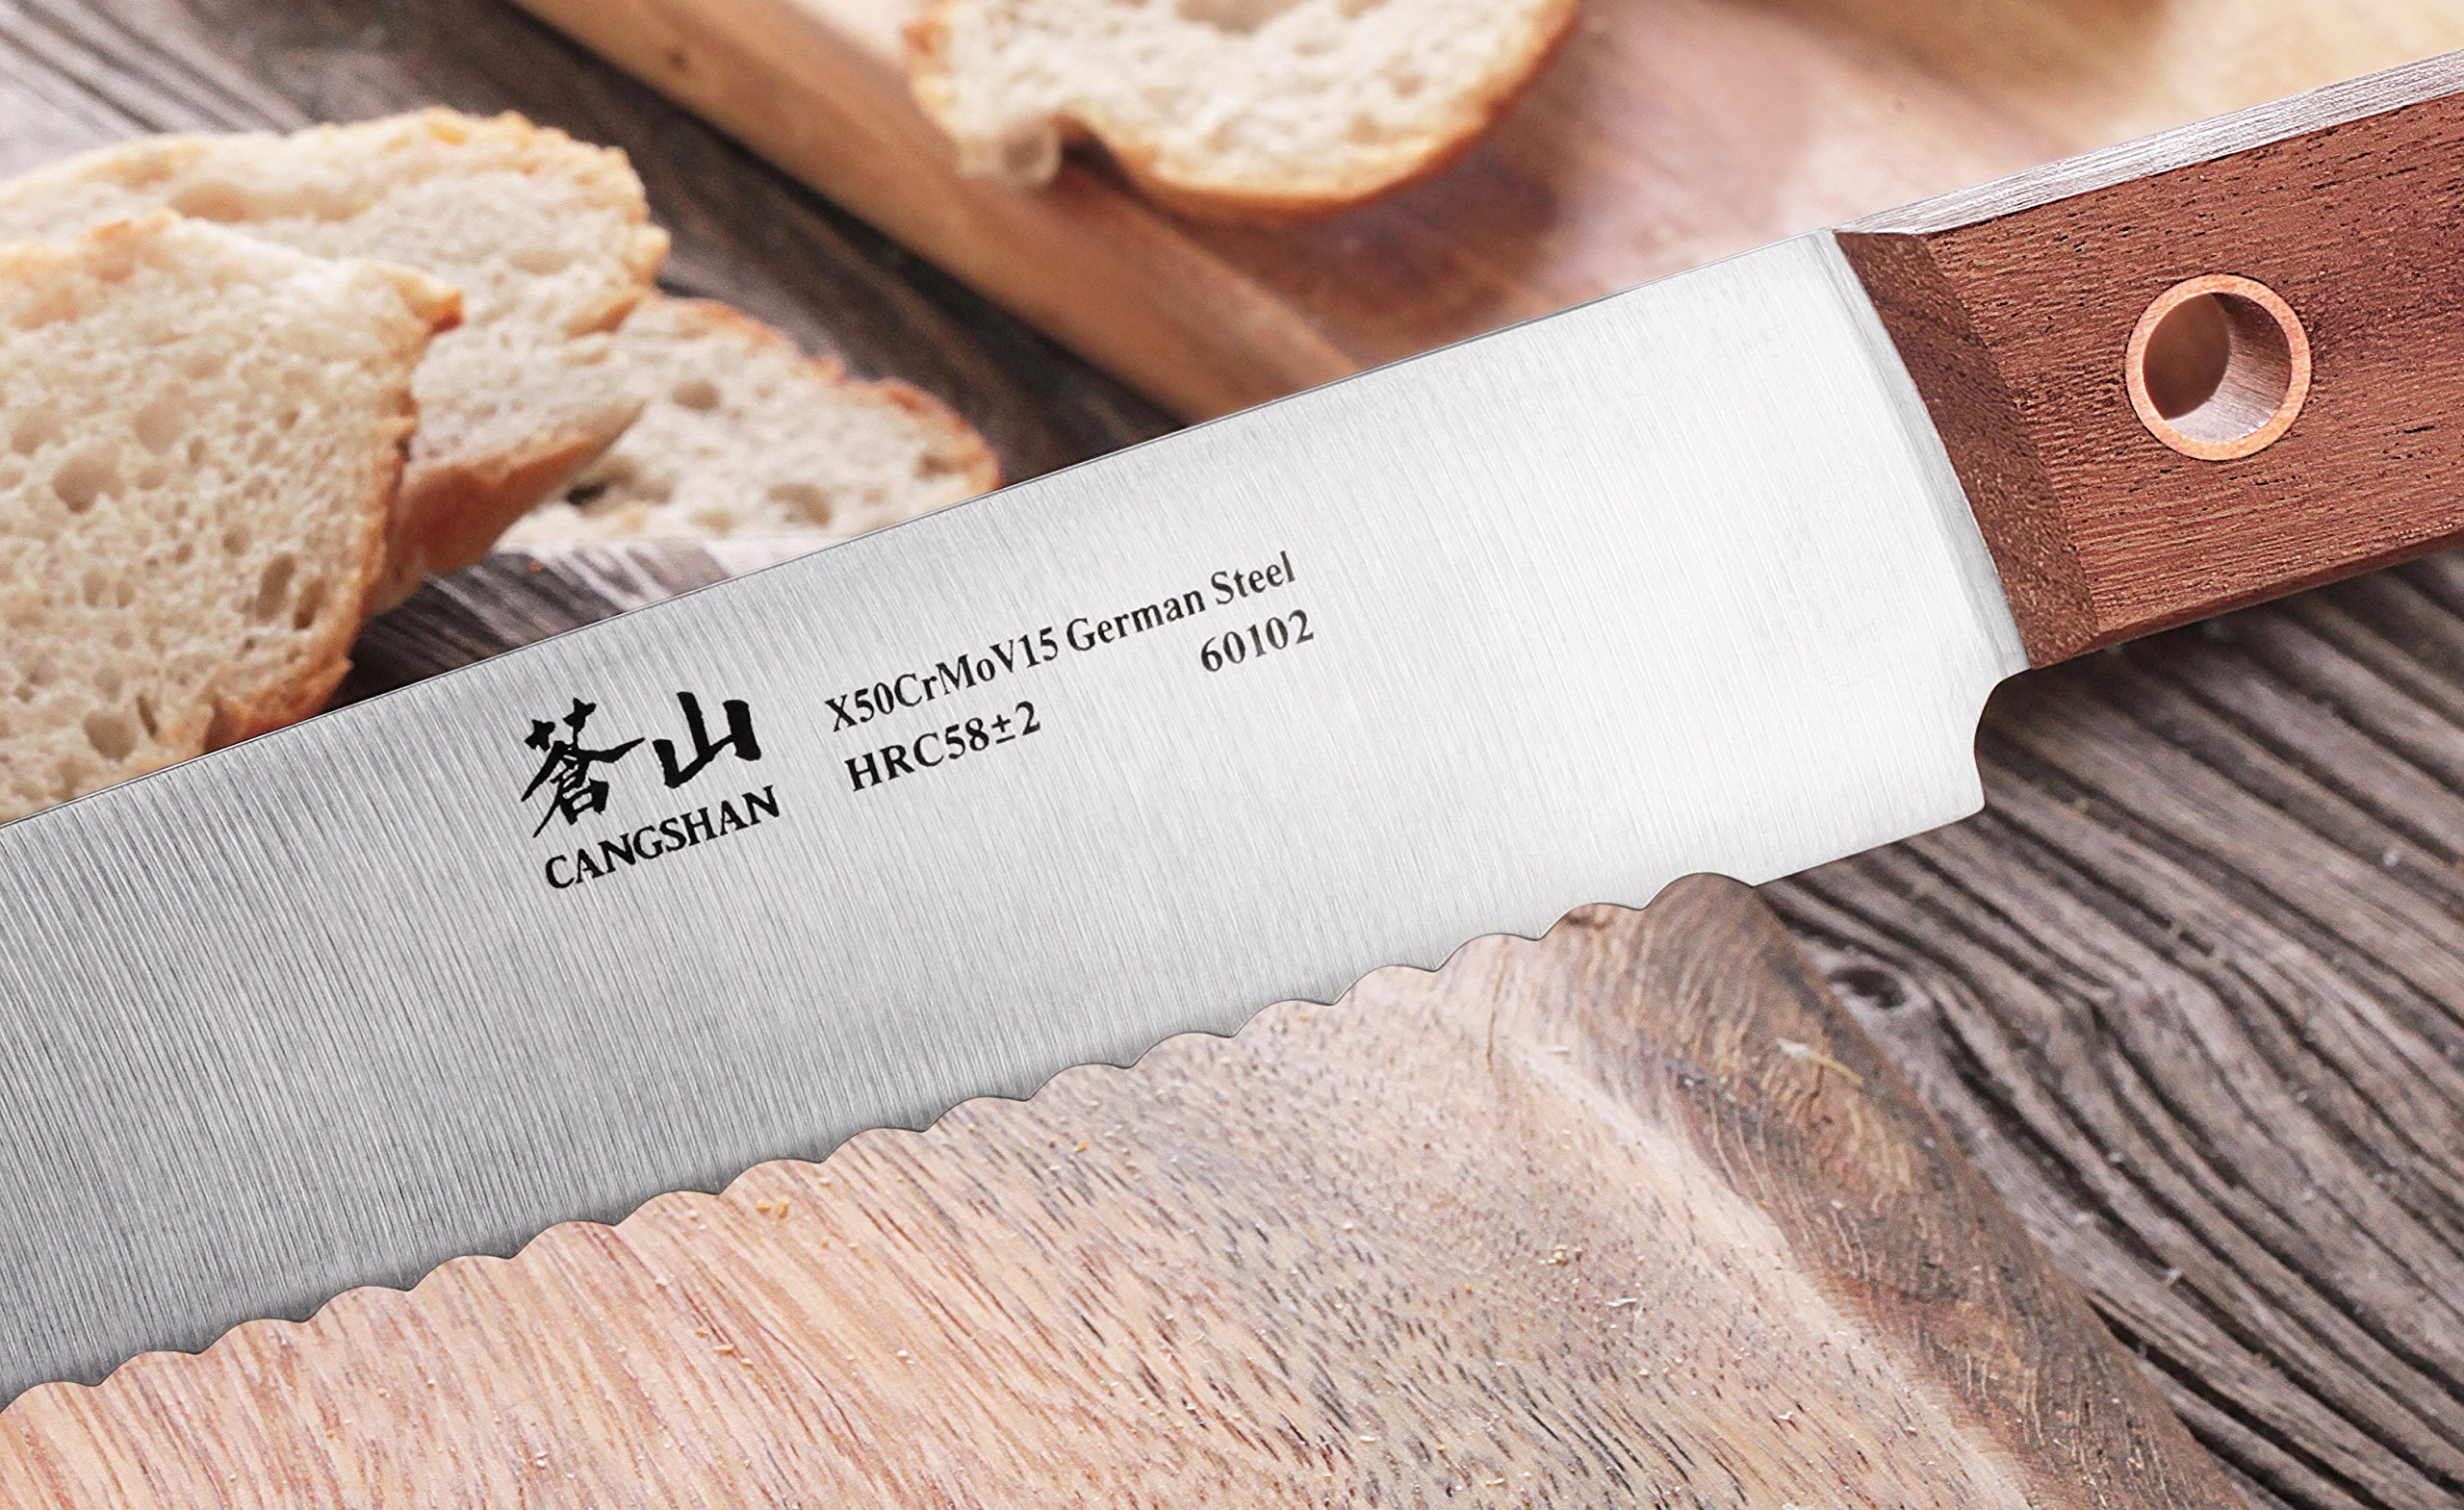 Cangshan W Series 60102 German Steel Bread Knife, 10.25'', Silver by Cangshan (Image #4)